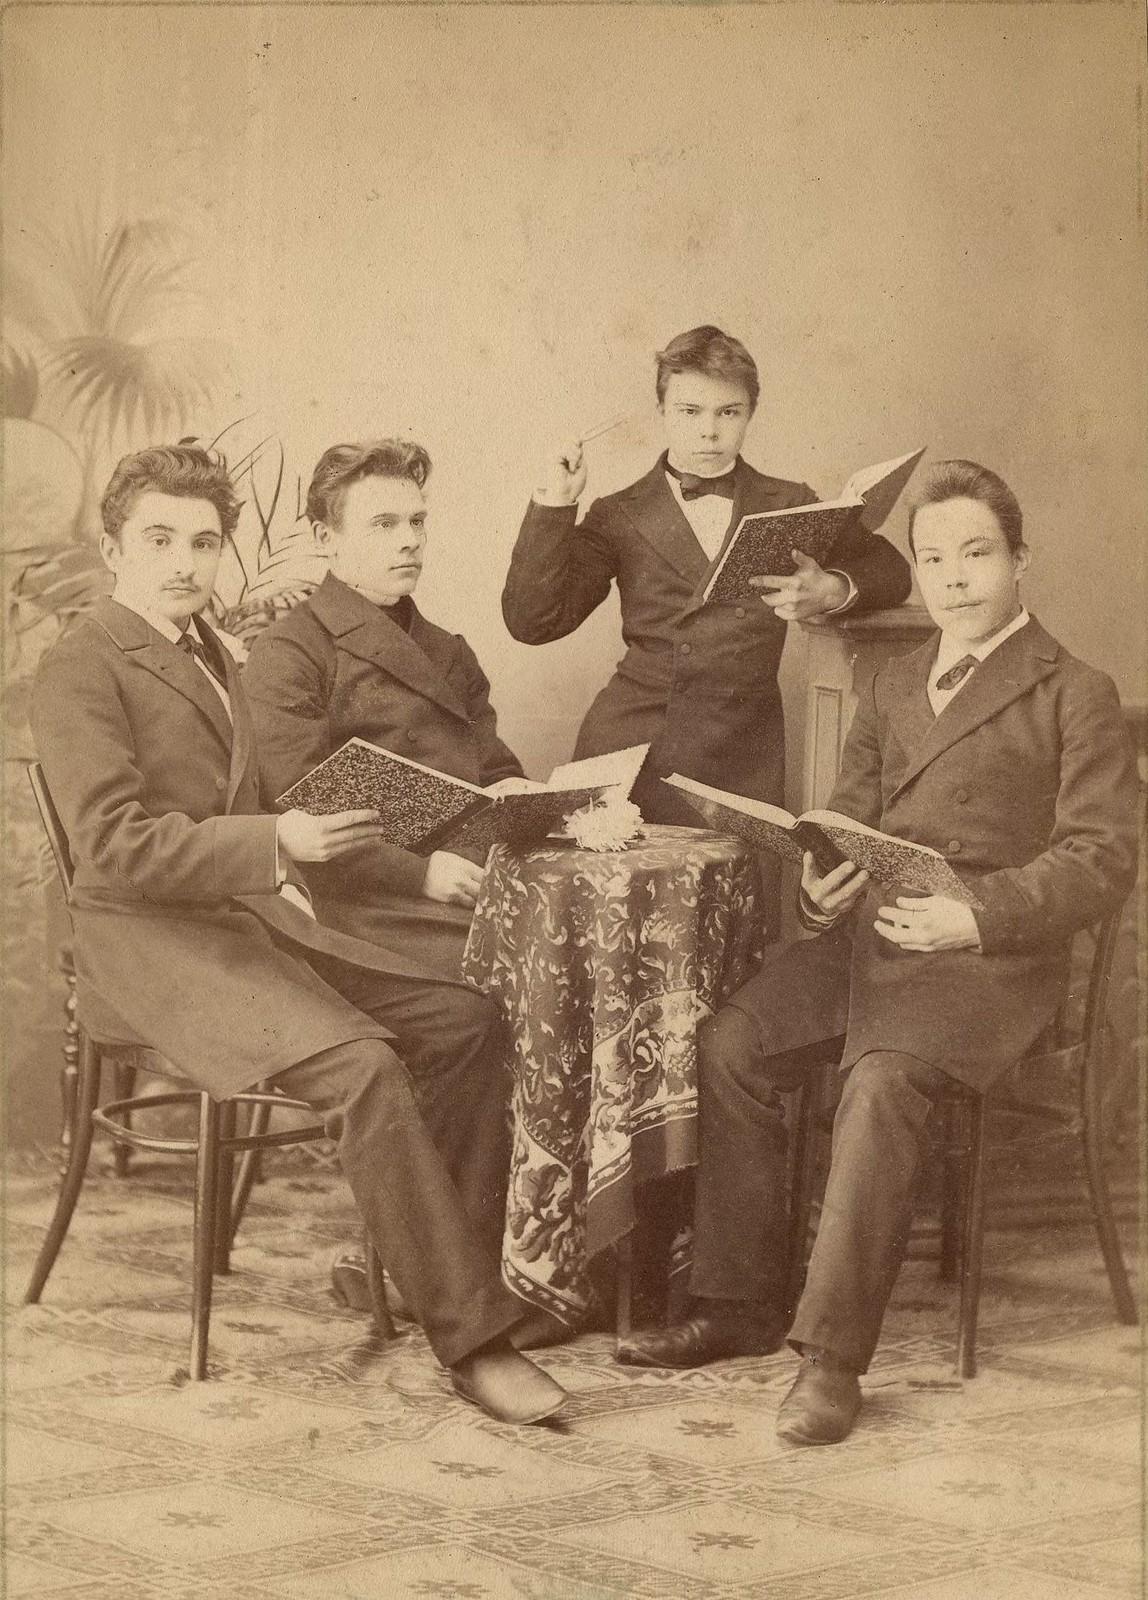 1890. Студент Пономарев Николай Александрович с товарищами